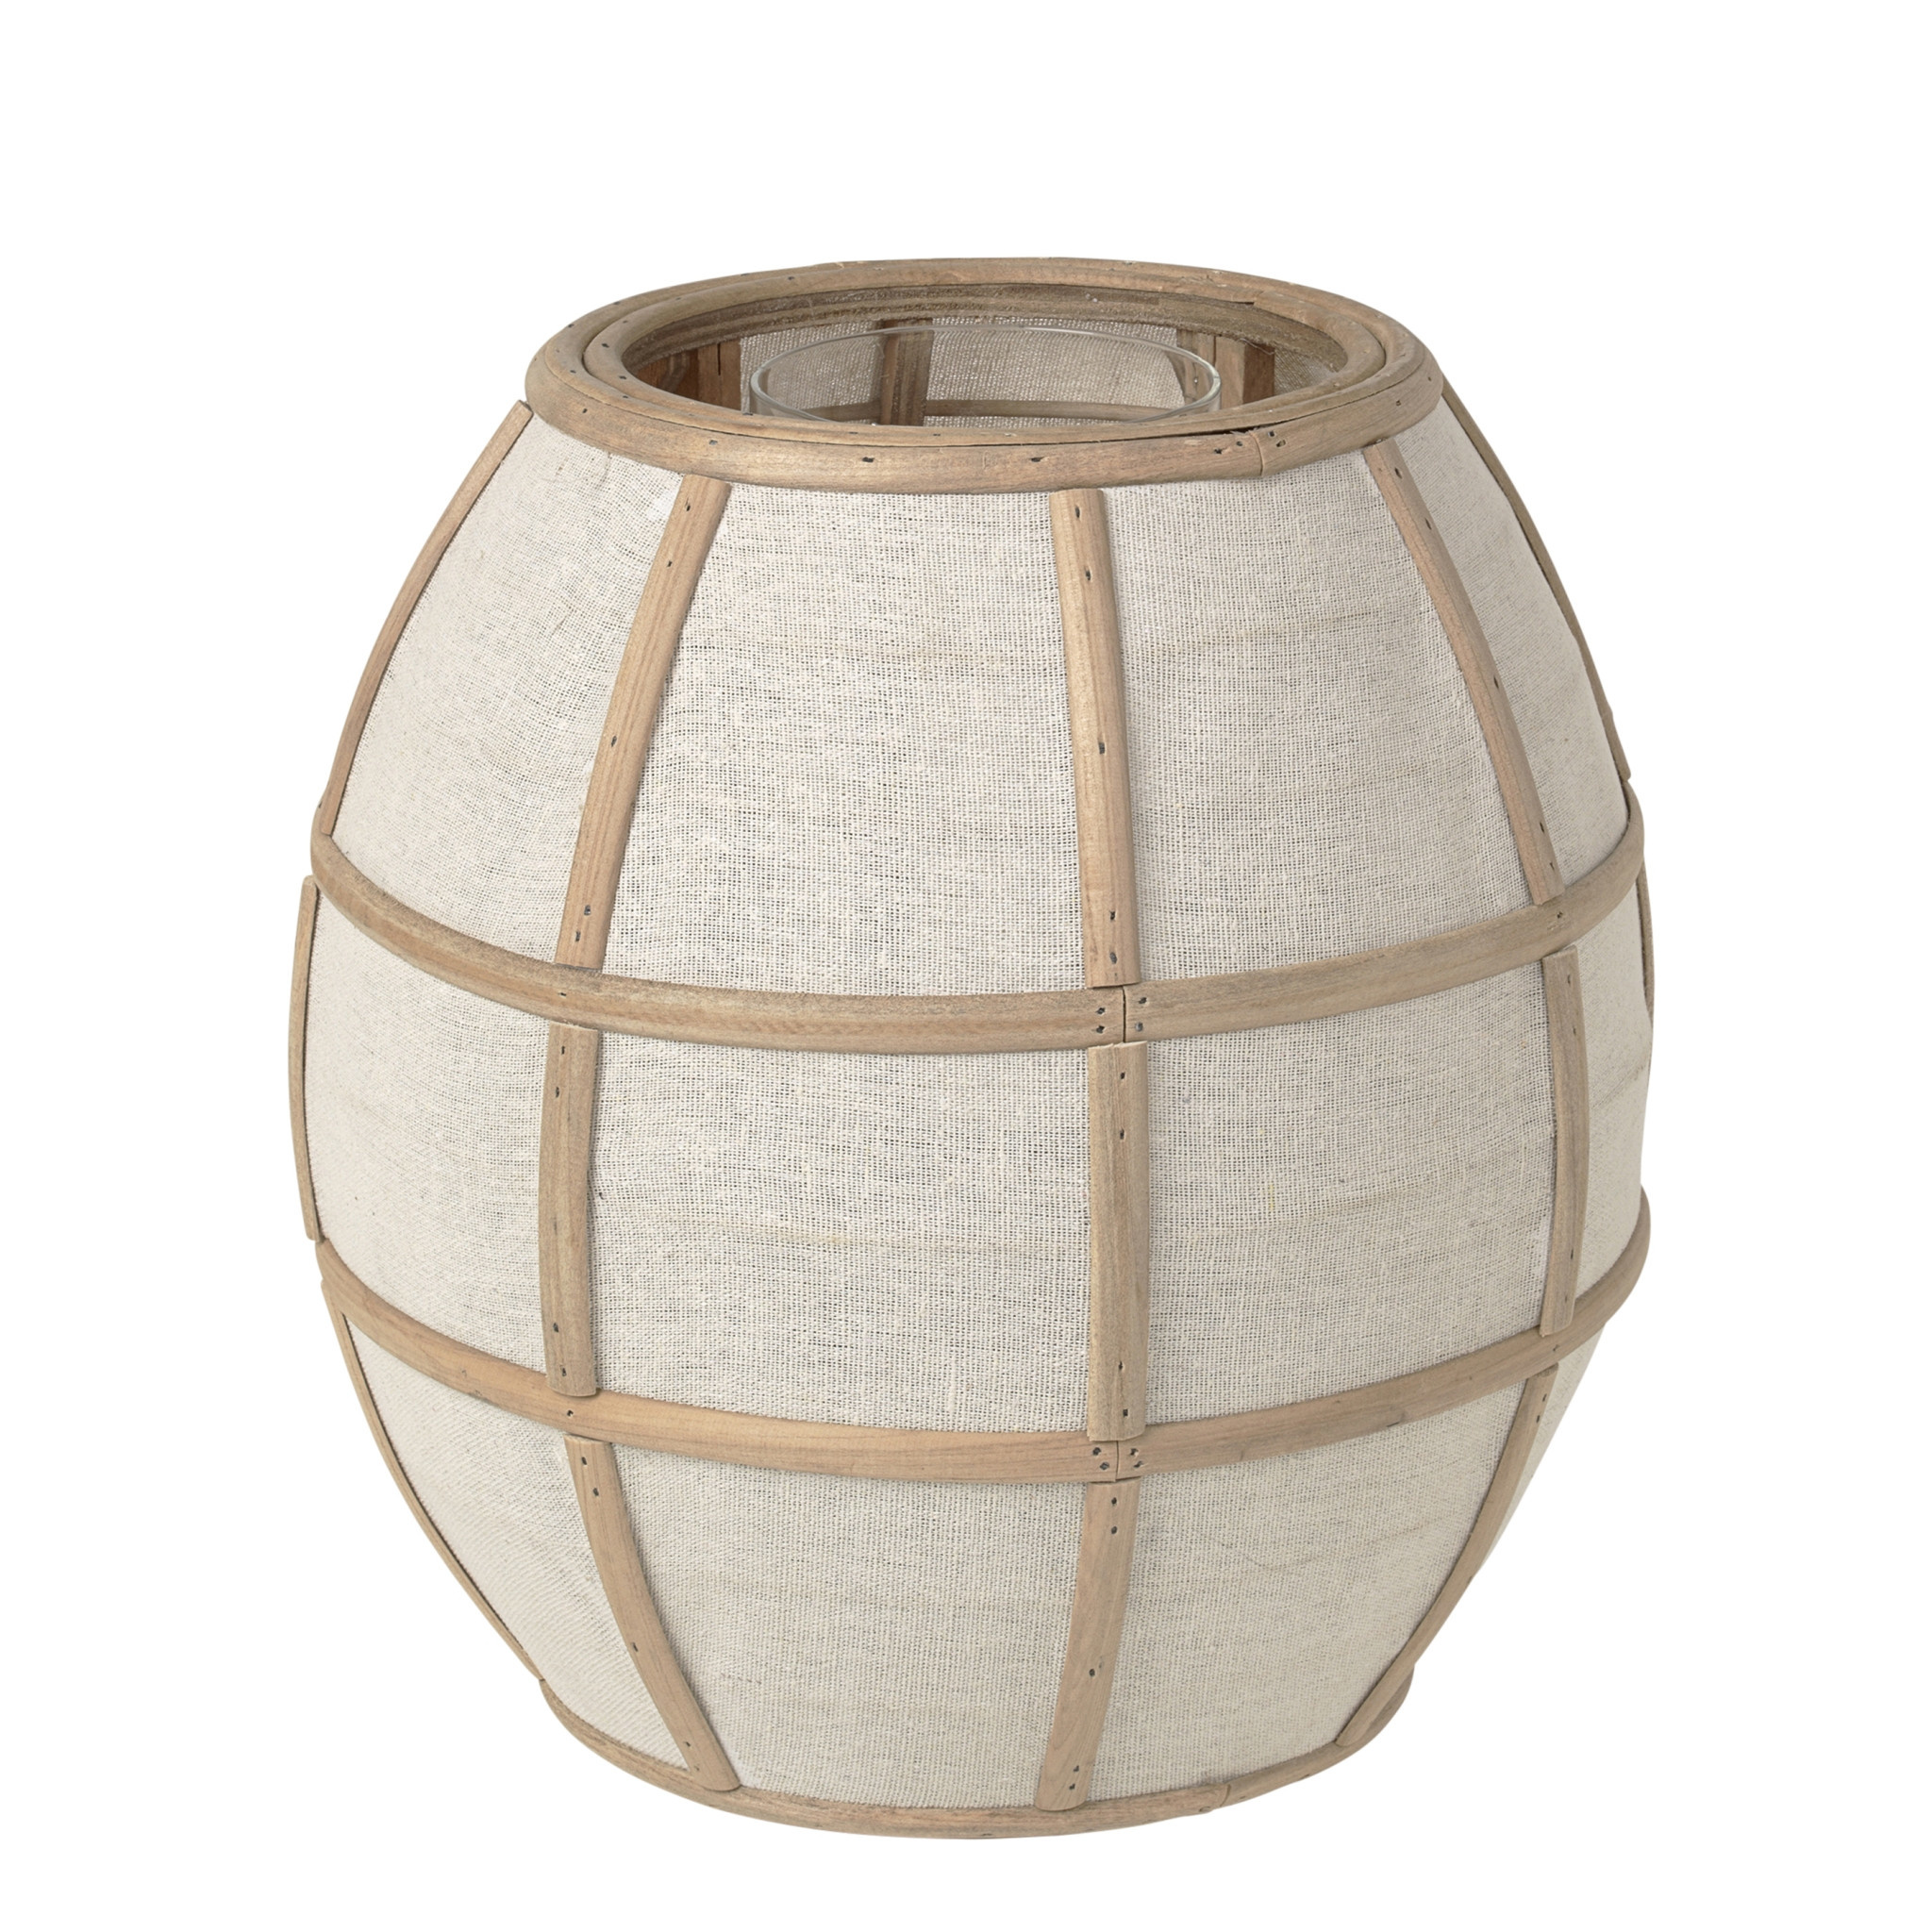 Broste Copenhagen Lantaarn 'stof' Bamboe/glas-14590798-5710688136148